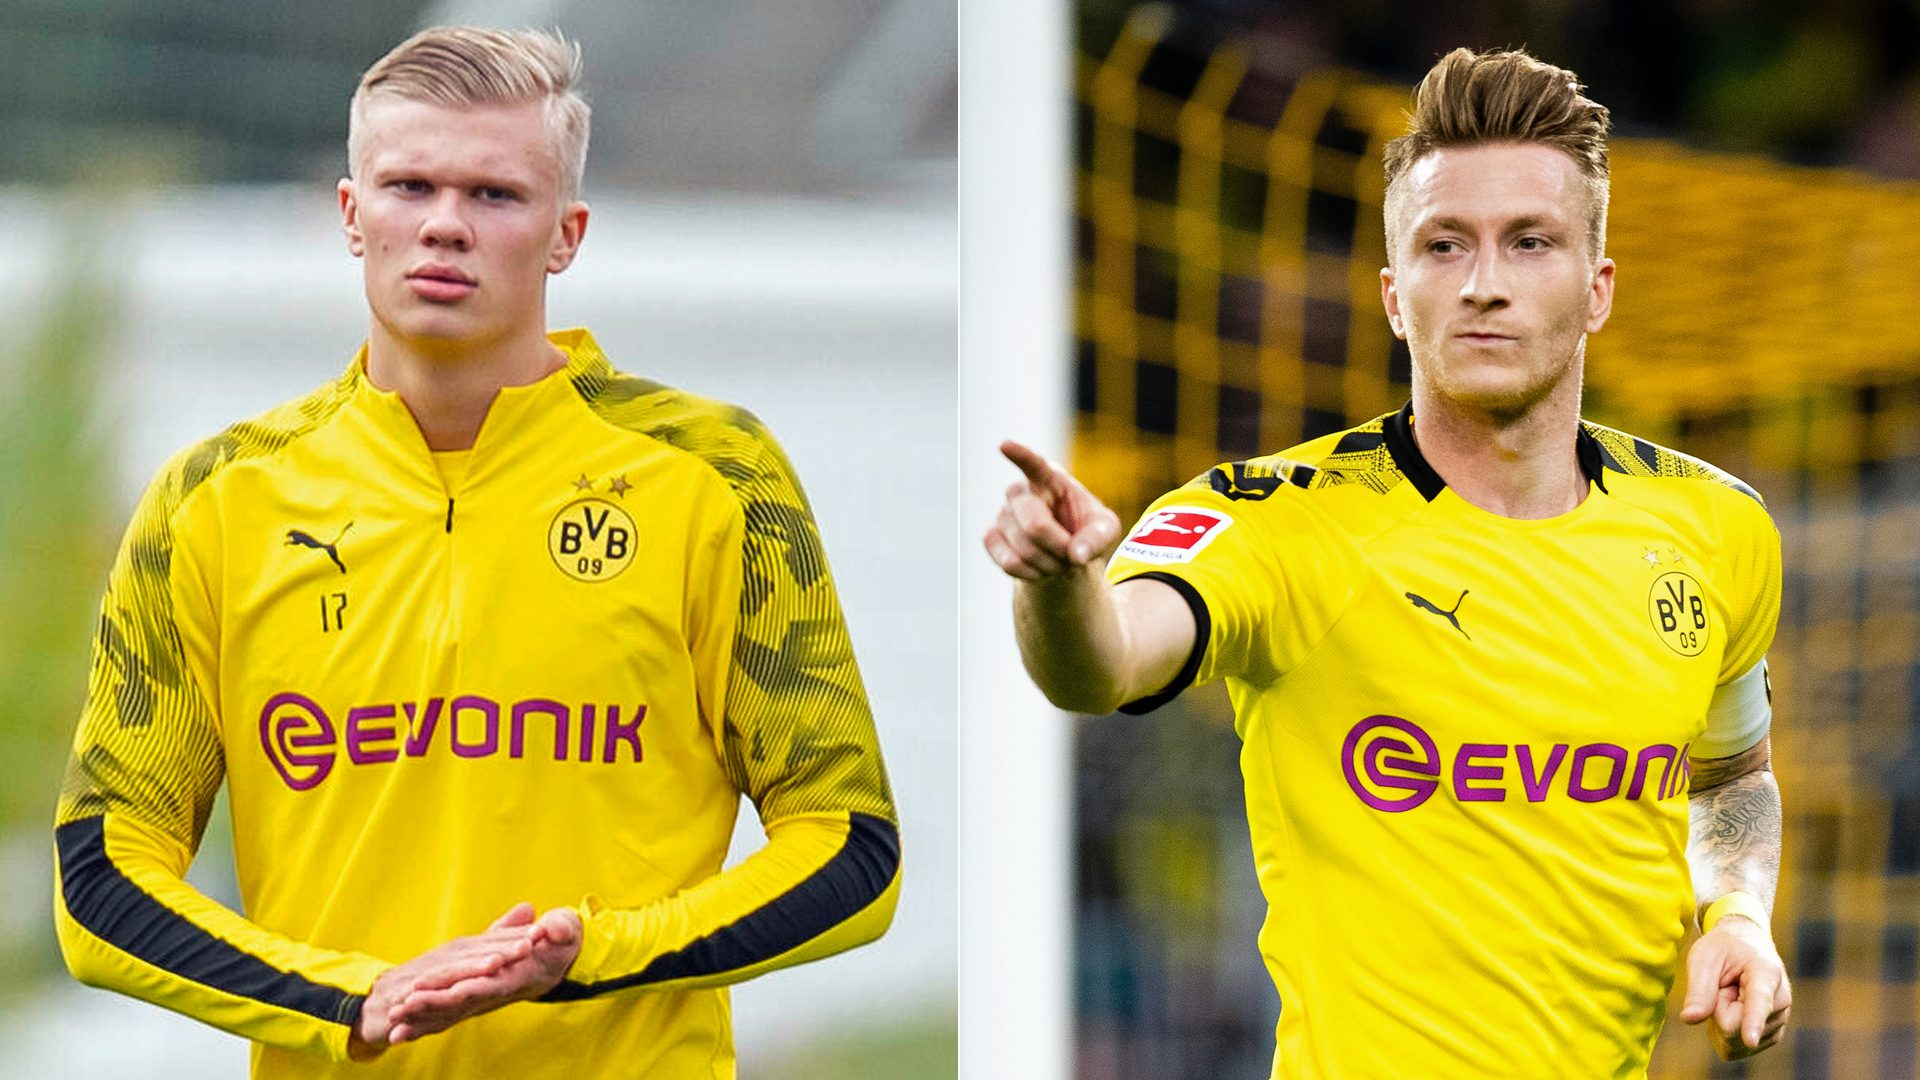 Bundesliga Marco Reus On Erling Haaland We Haven T Had That Kind Of Striker Since Robert Lewandowski